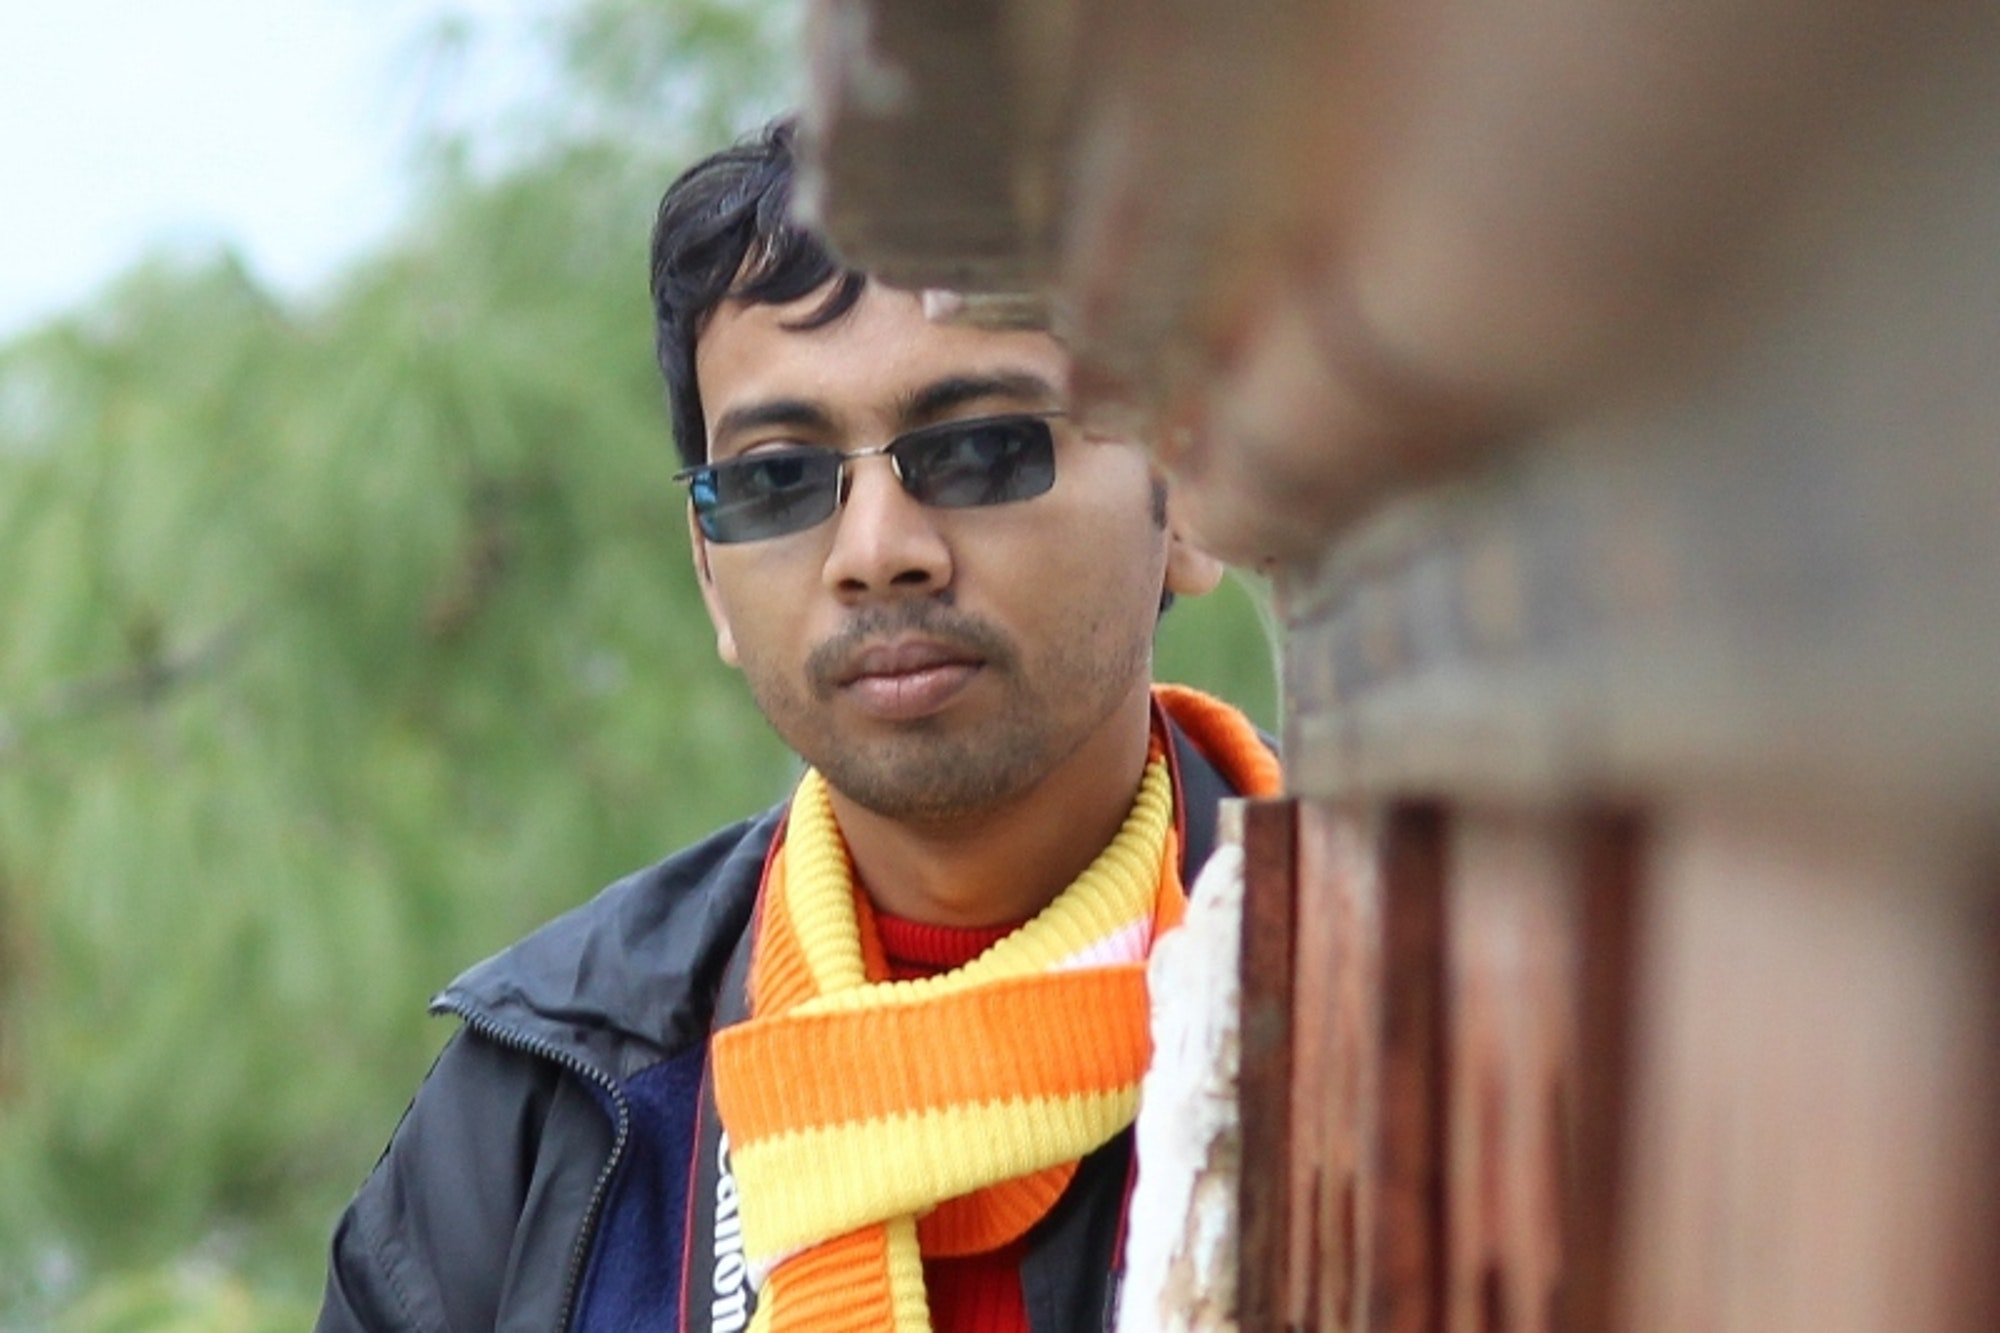 Pathfinder spotlight: Kalyan Panja, Travtasy